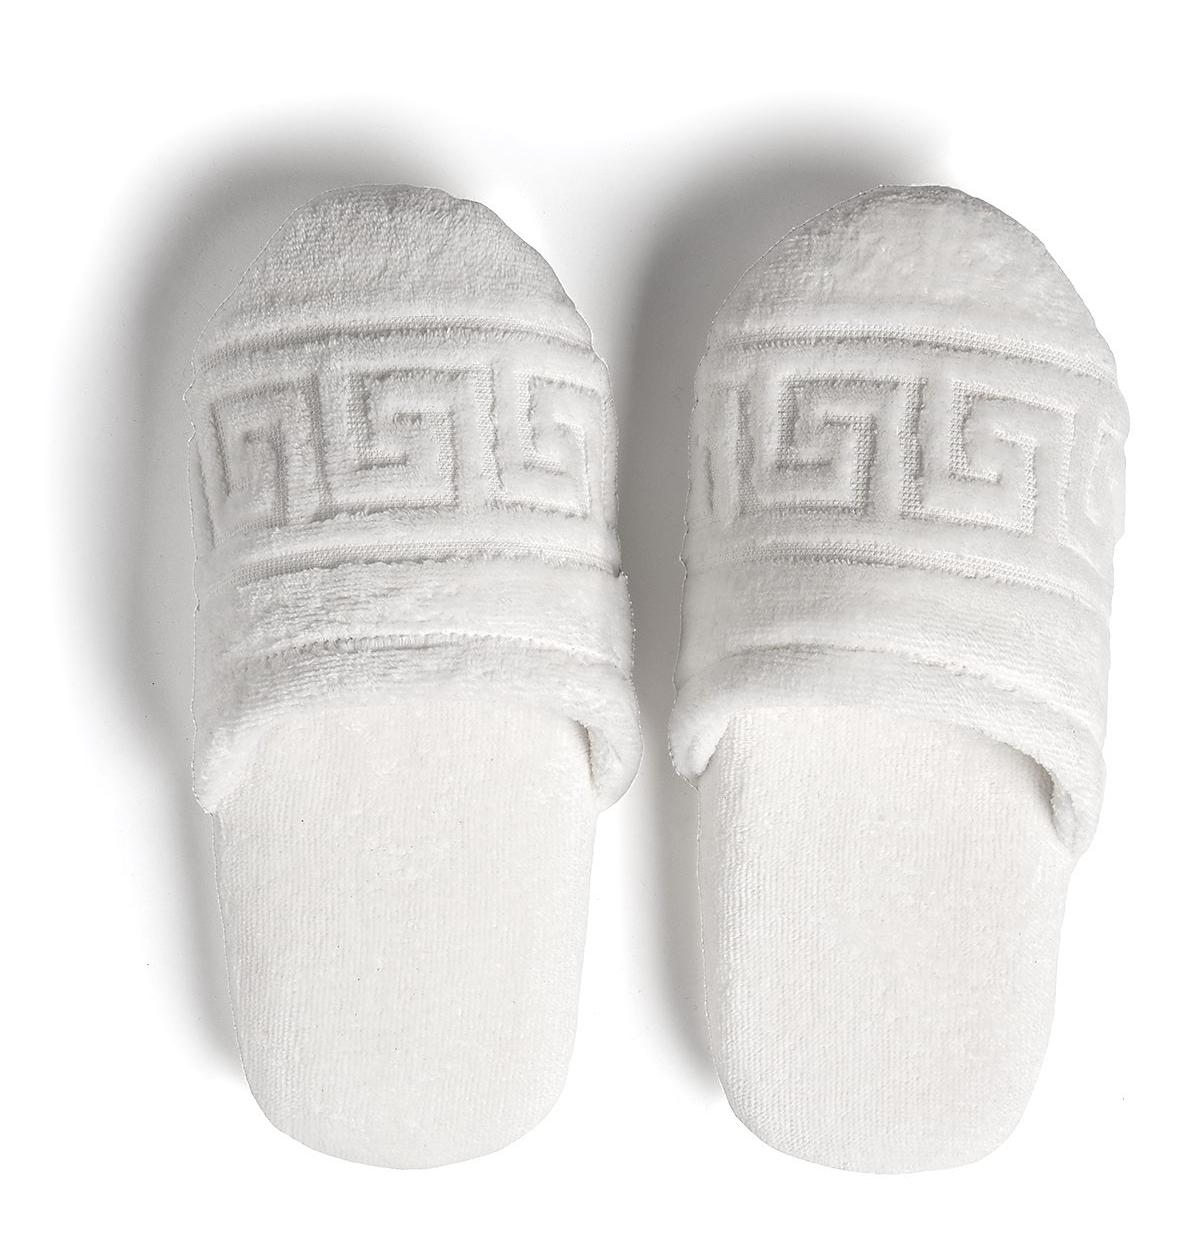 Versace Slippers, $75